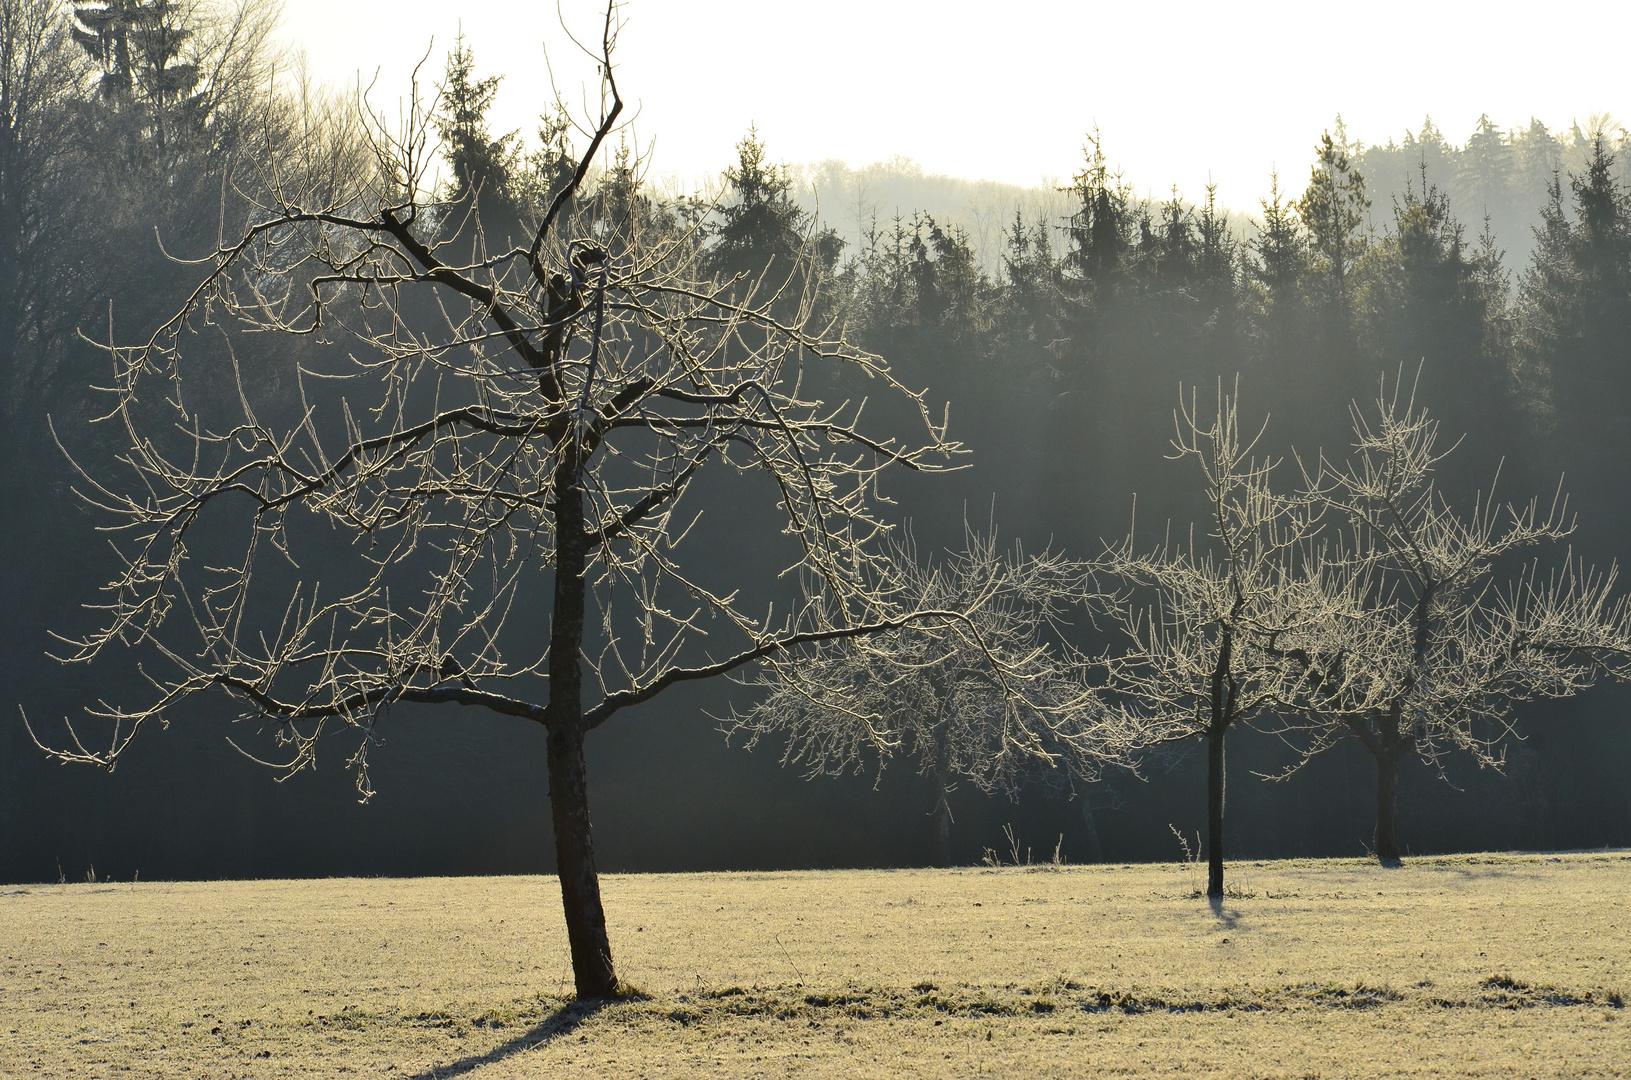 Apfelbäume im Winter